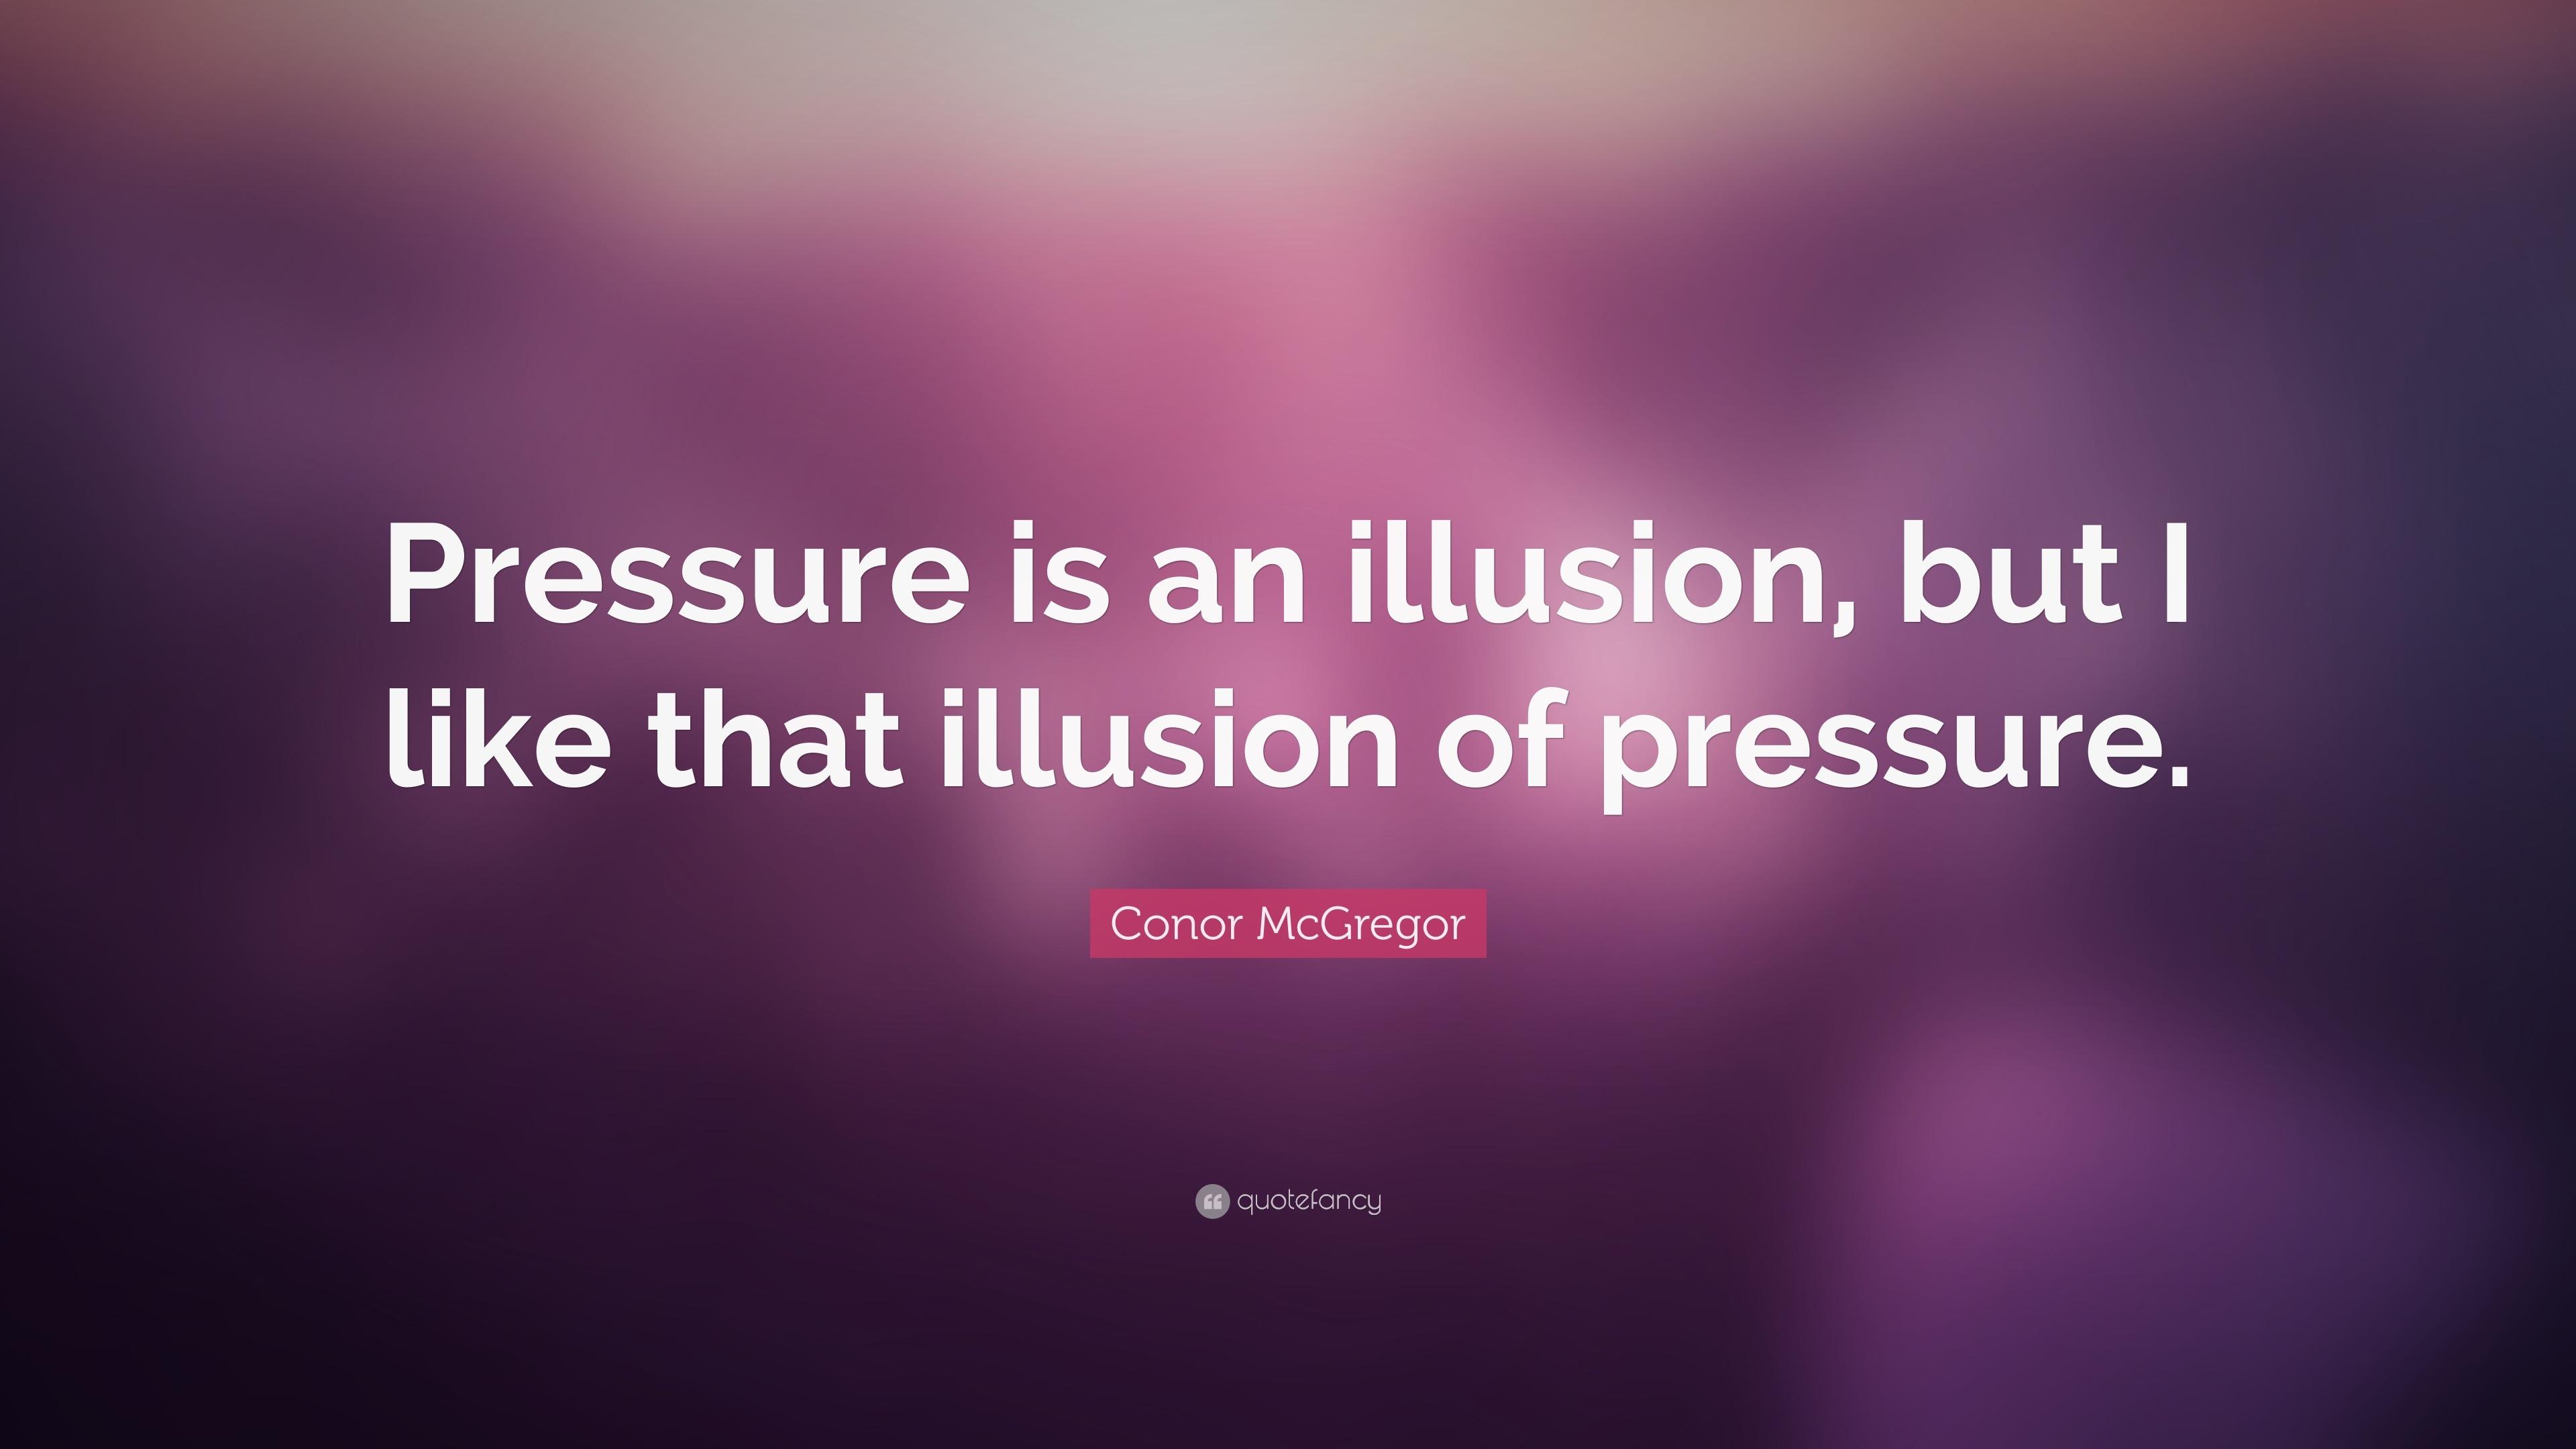 Casey Neistat Quotes Wallpaper Conor Mcgregor Quotes 64 Wallpapers Quotefancy